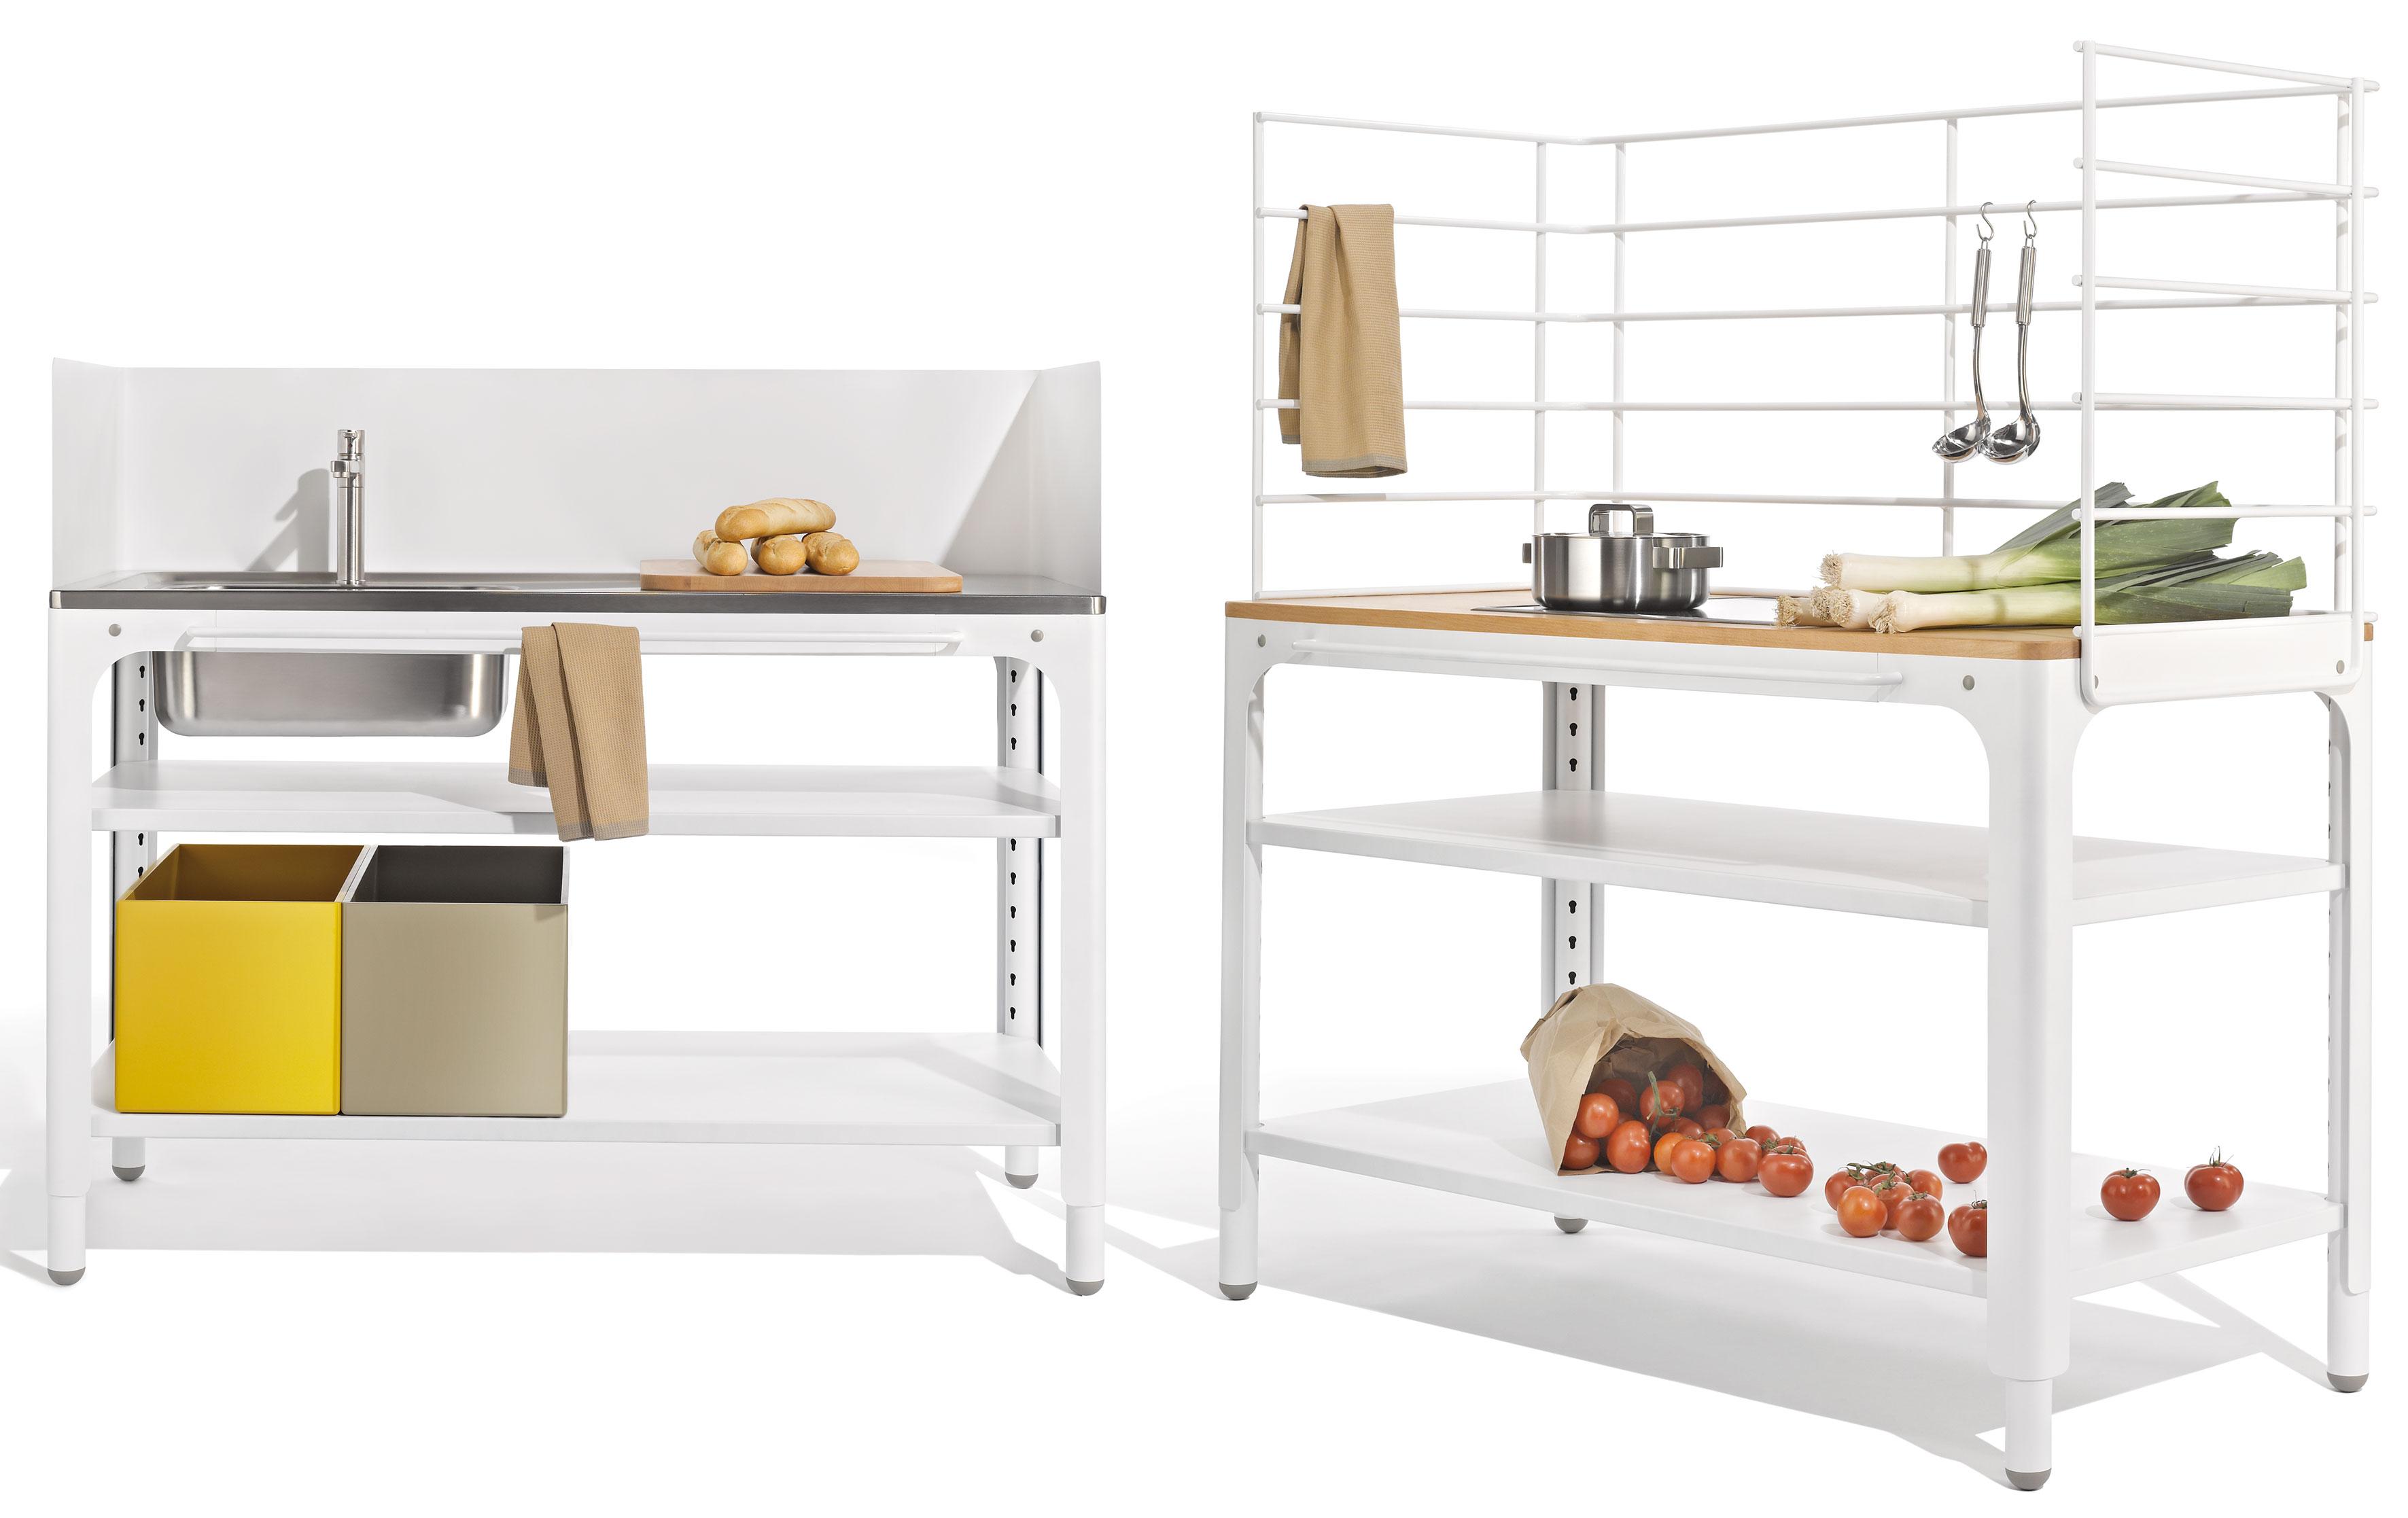 Naber  n by Naber Concept Kitchen